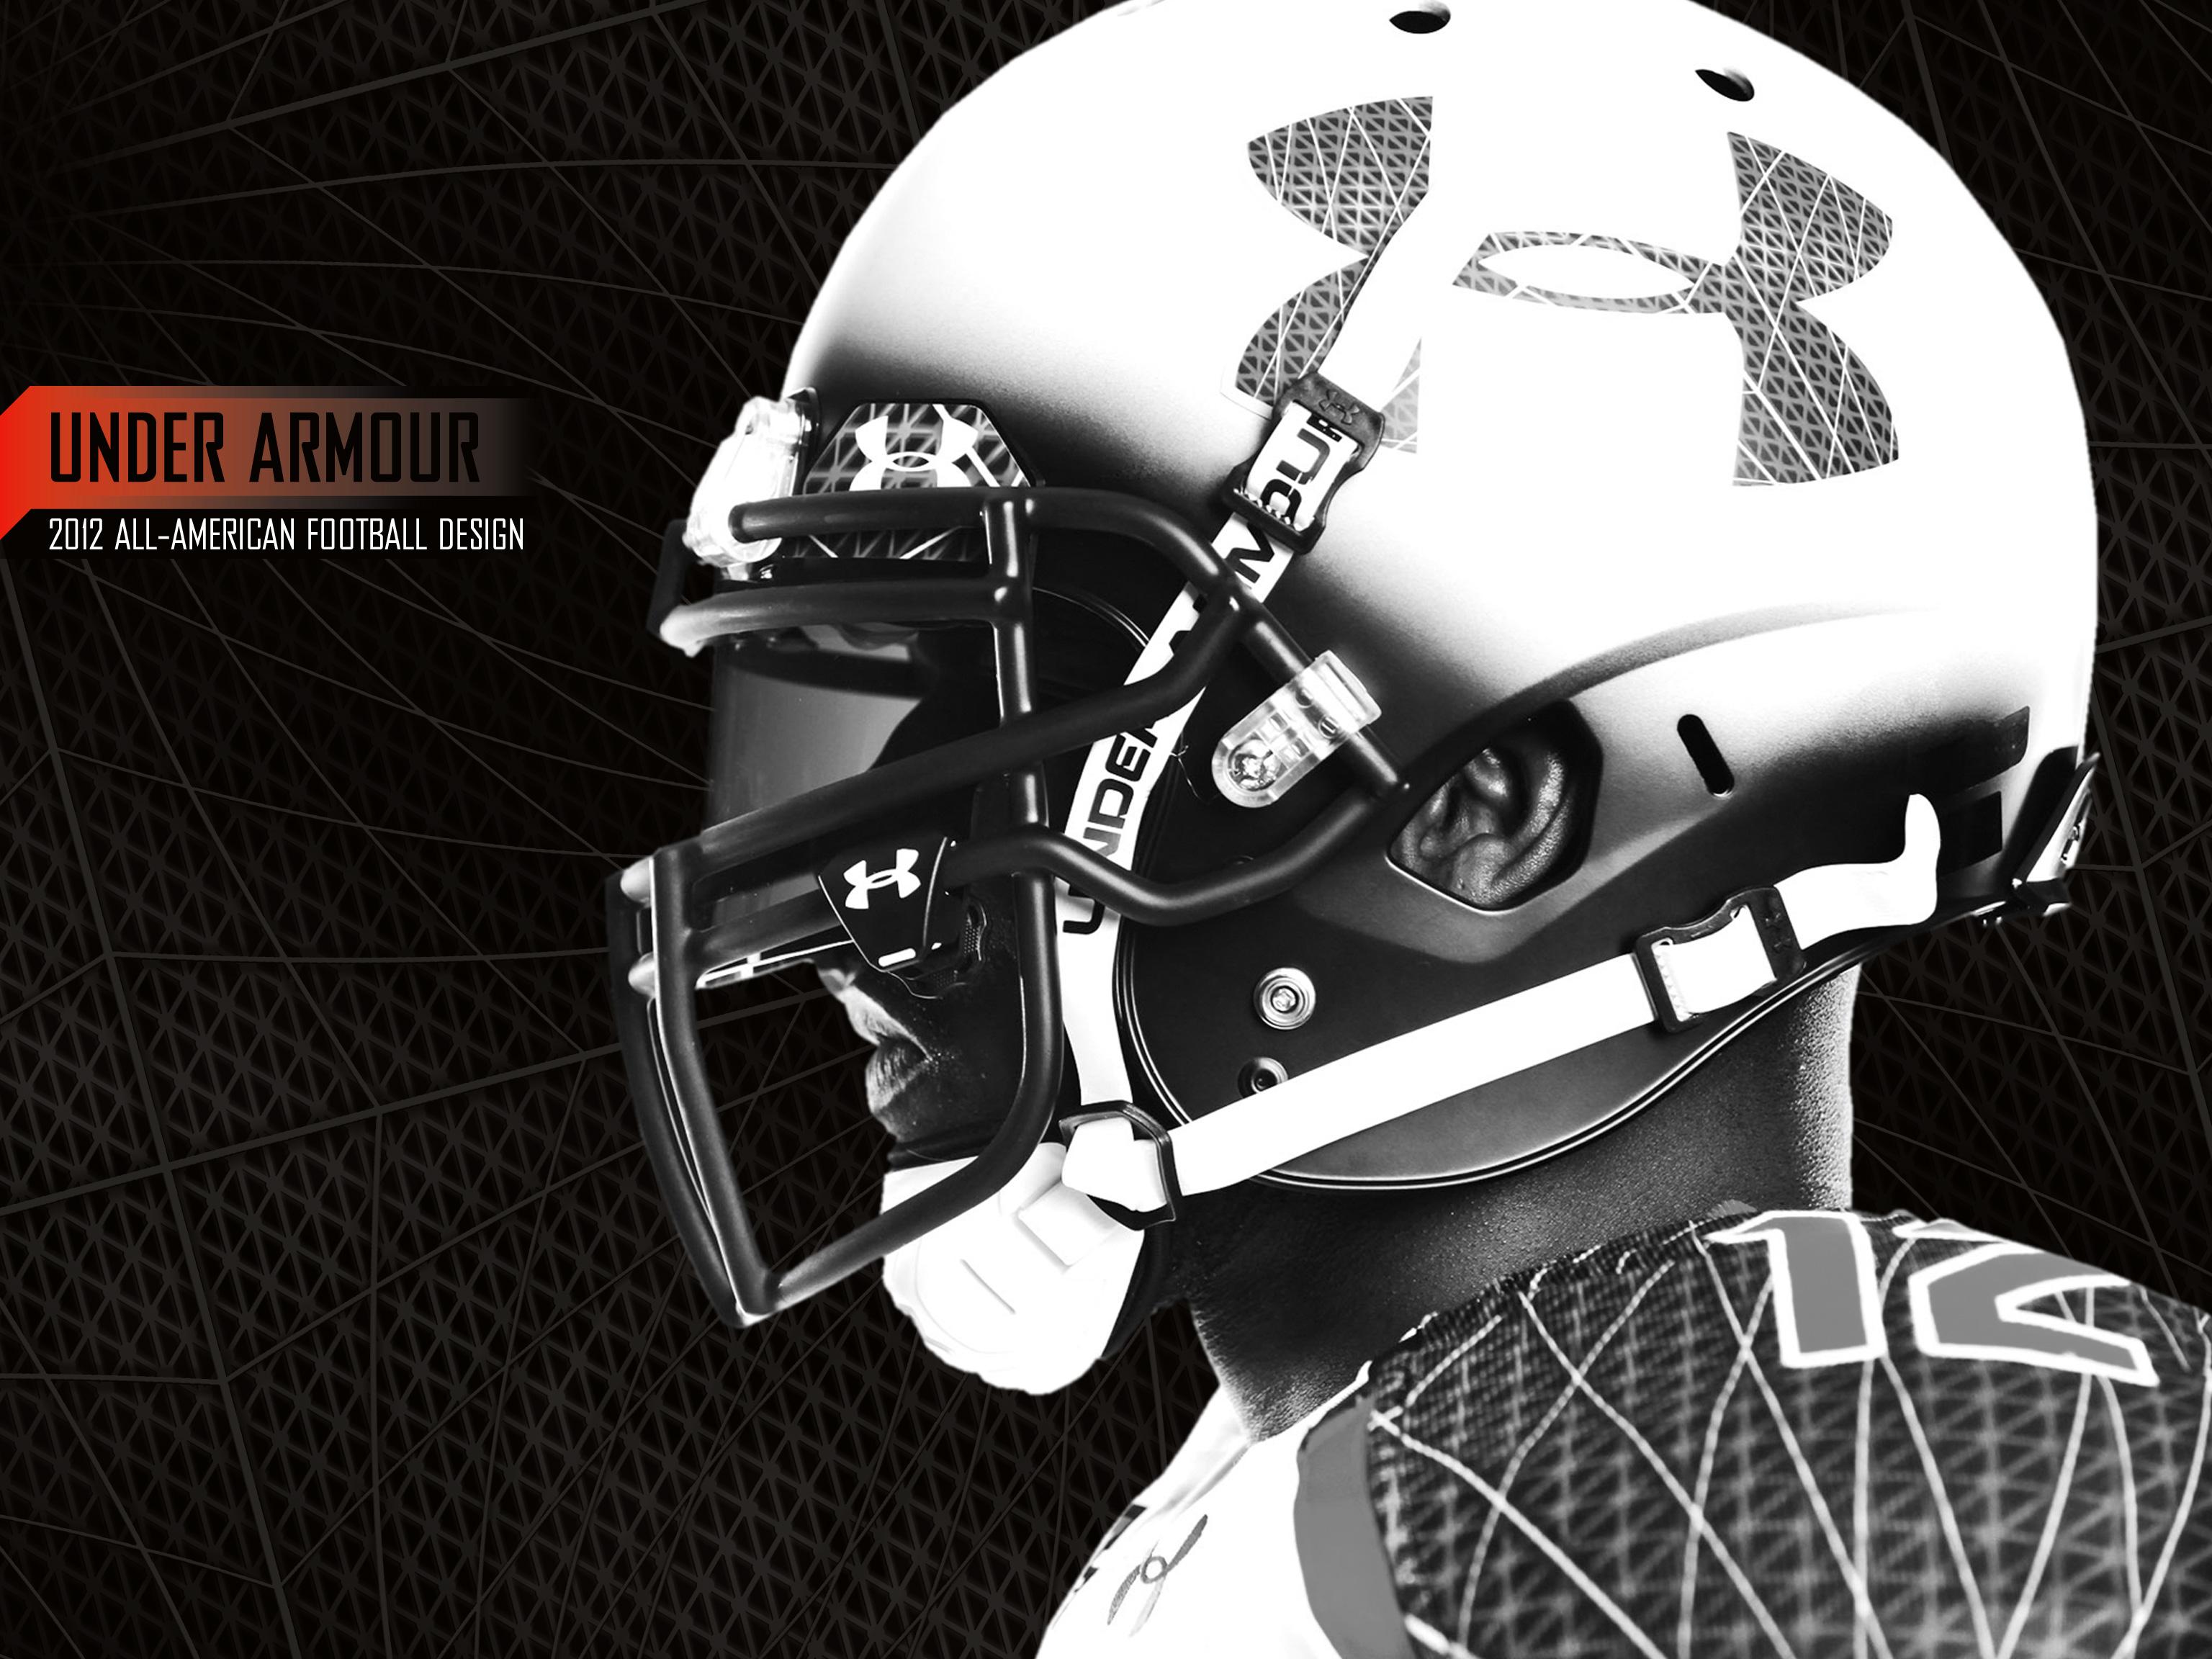 Logo Under Armor >> Under Armour Football Wallpaper - WallpaperSafari